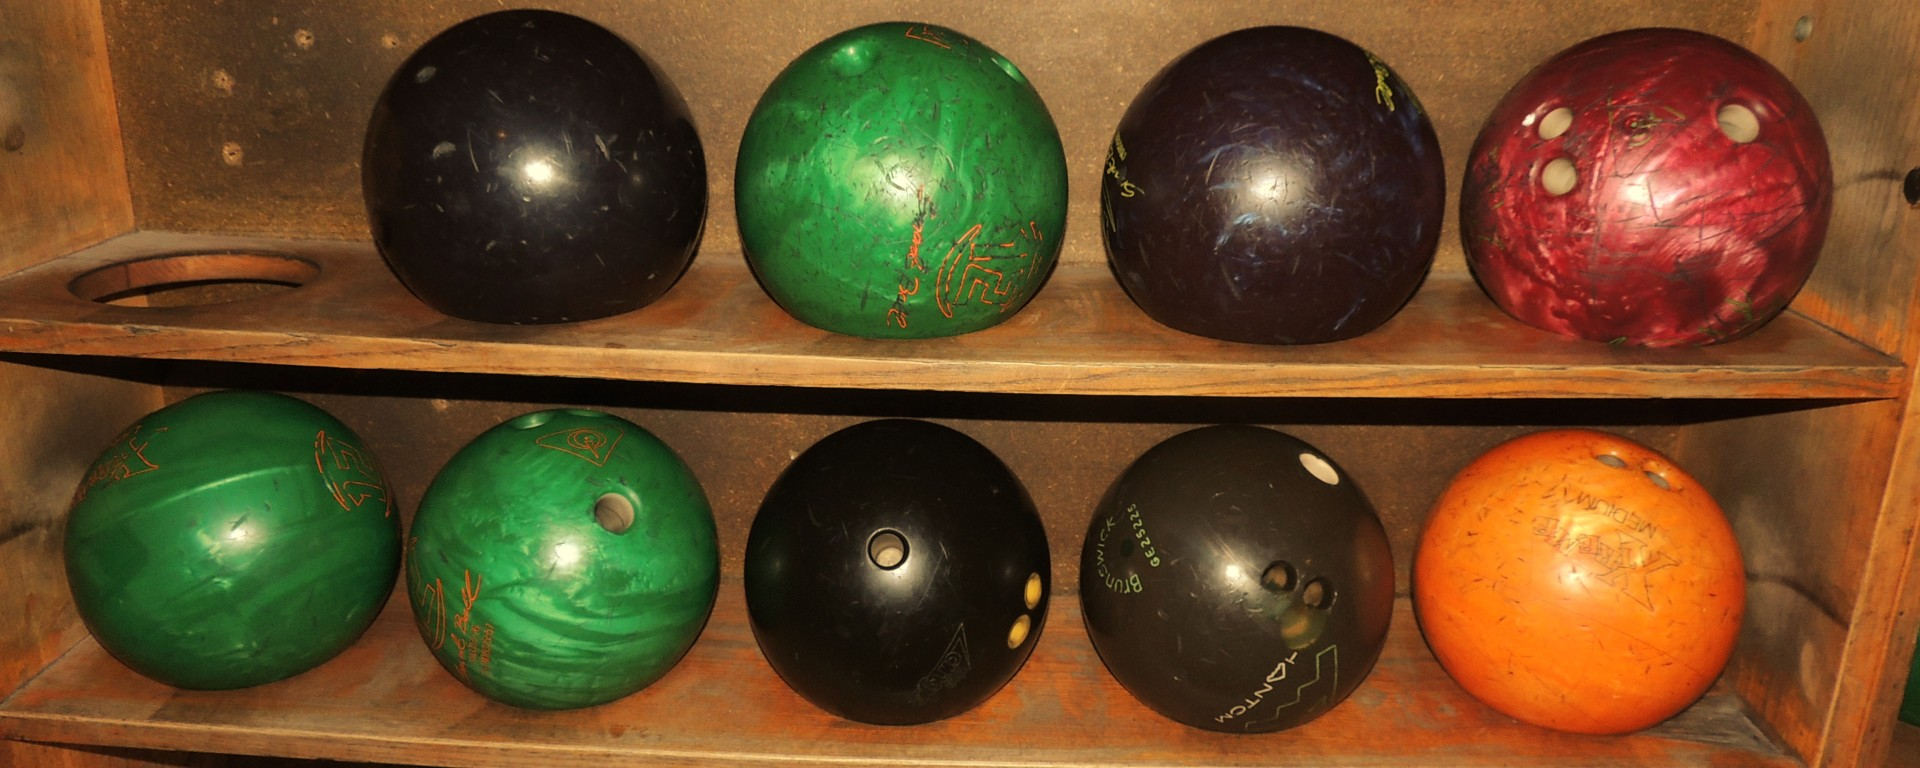 anniversaire bowling mouffetard